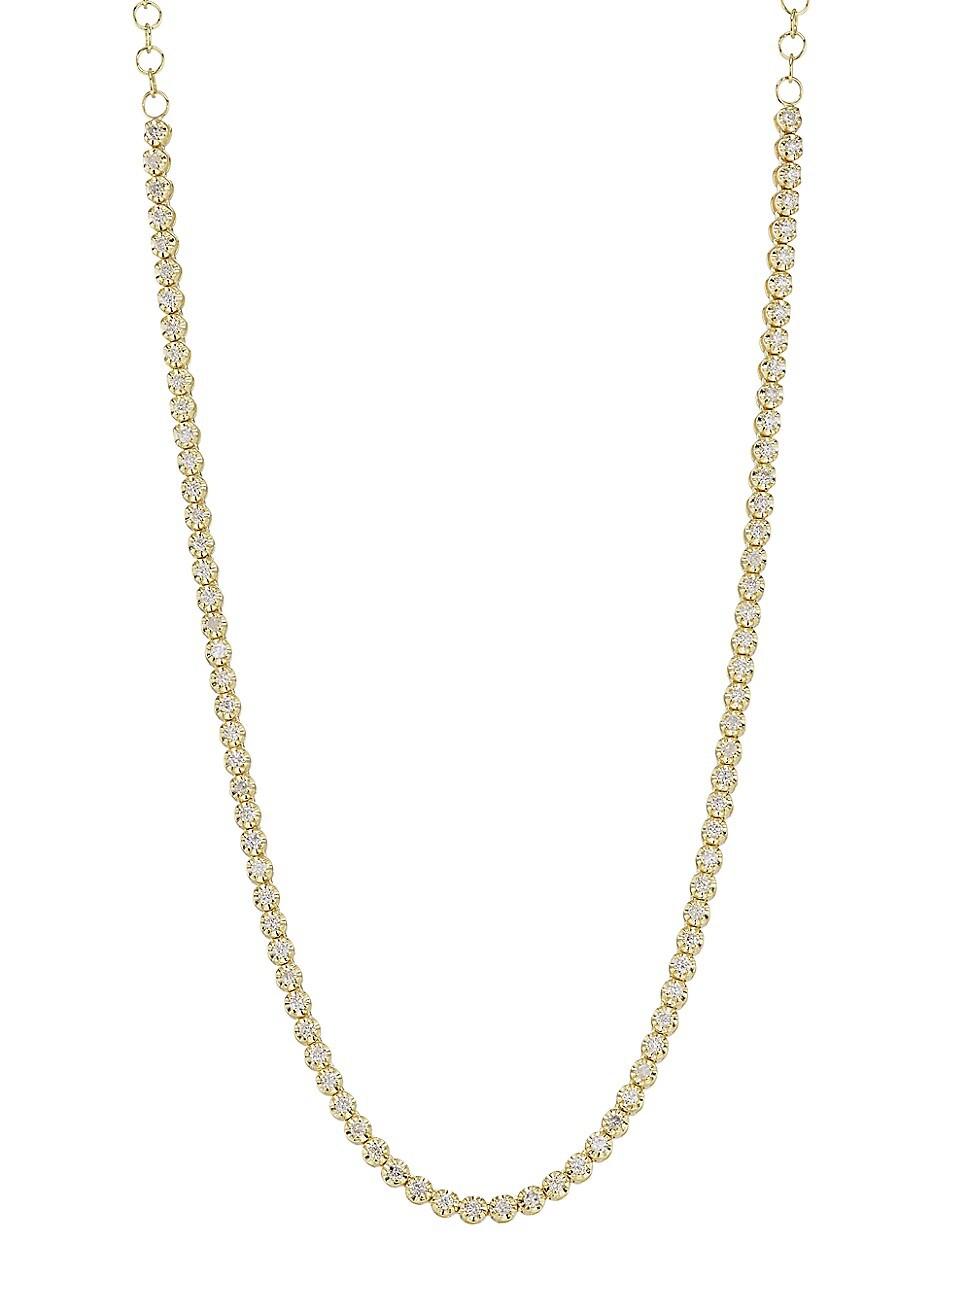 Meira T 14k Yellow Gold & Diamond Tennis Necklace